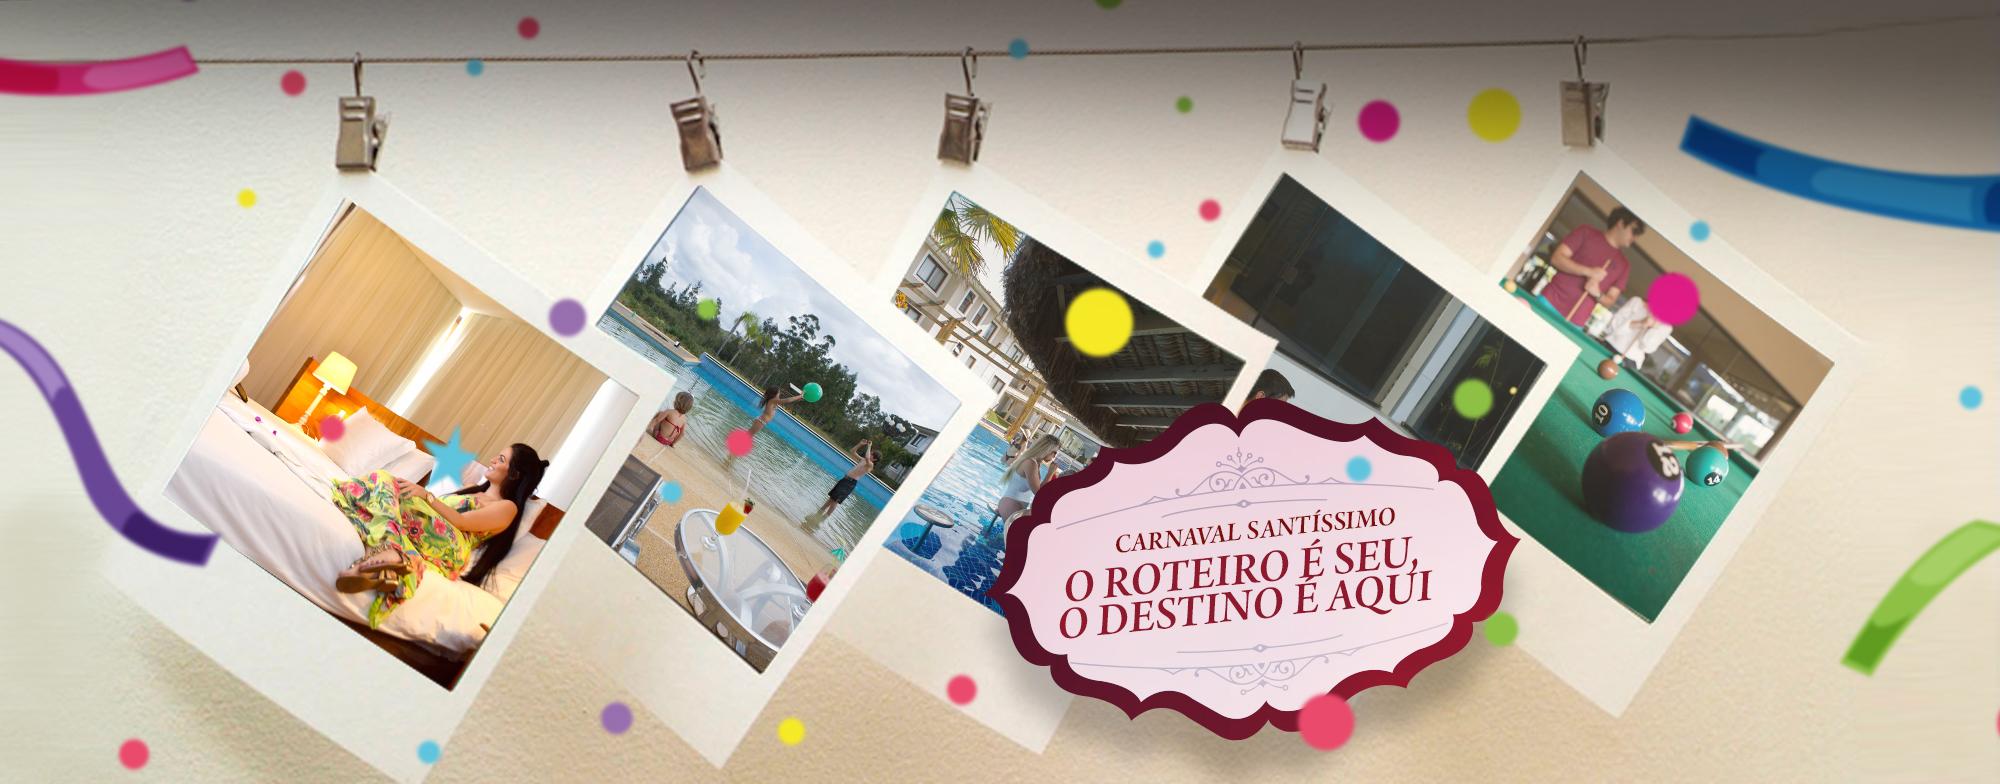 santissimo_tiradentes_carnaval_resort5